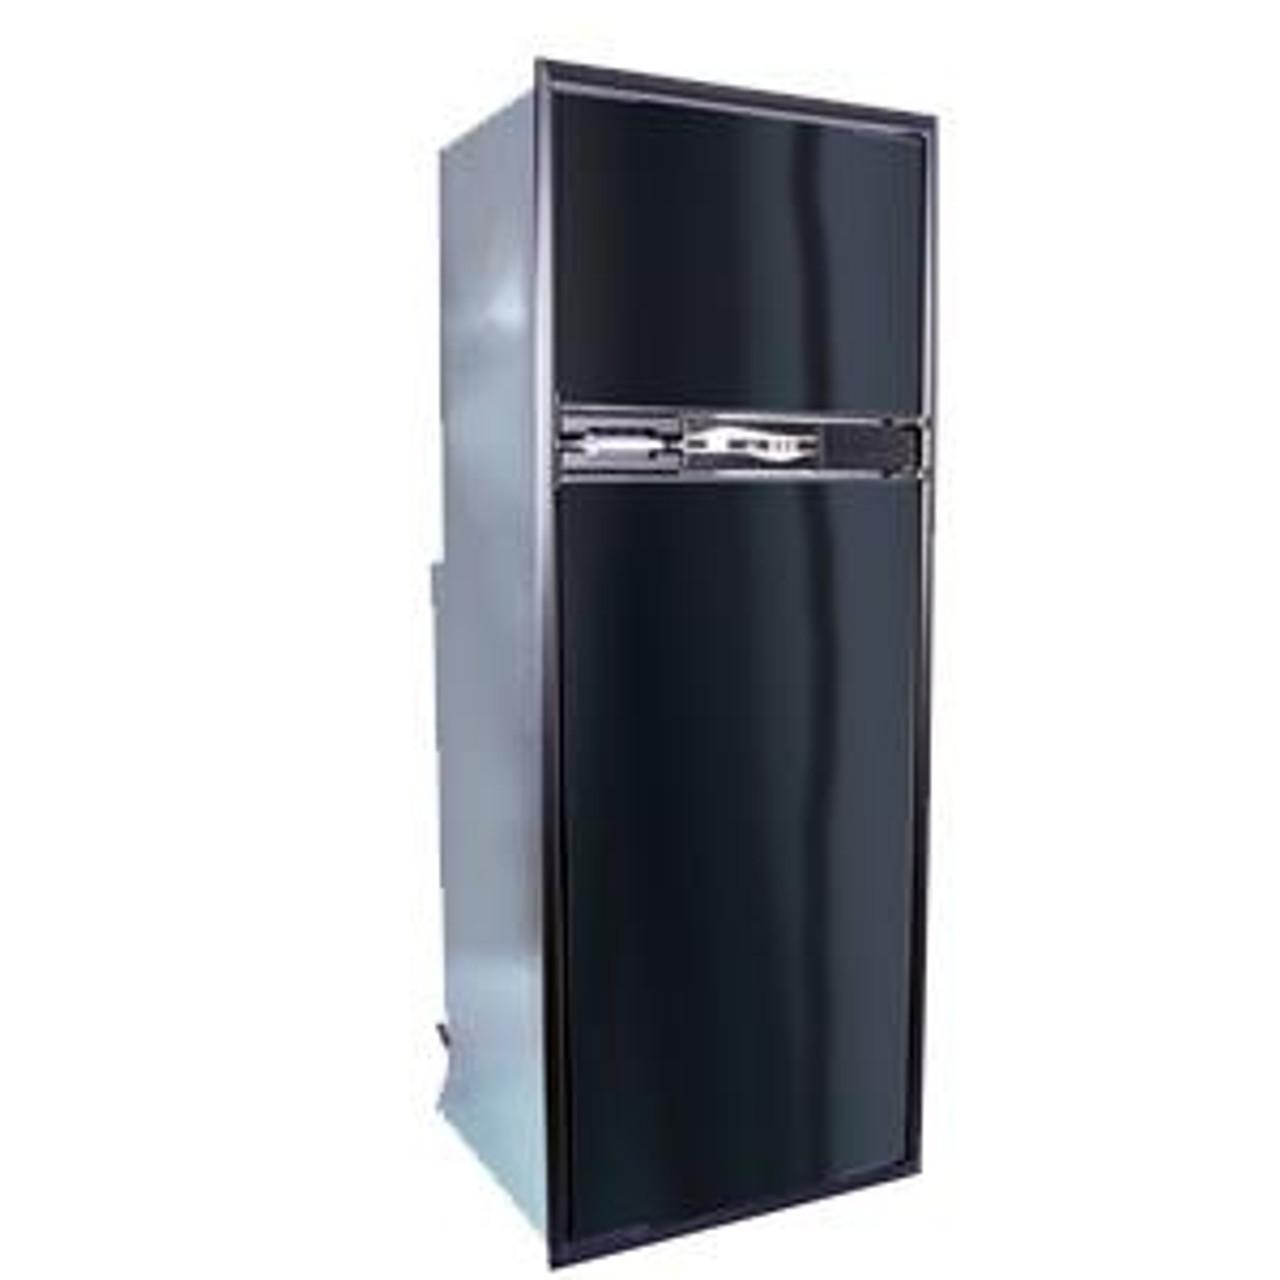 RV Refrigerator door panels